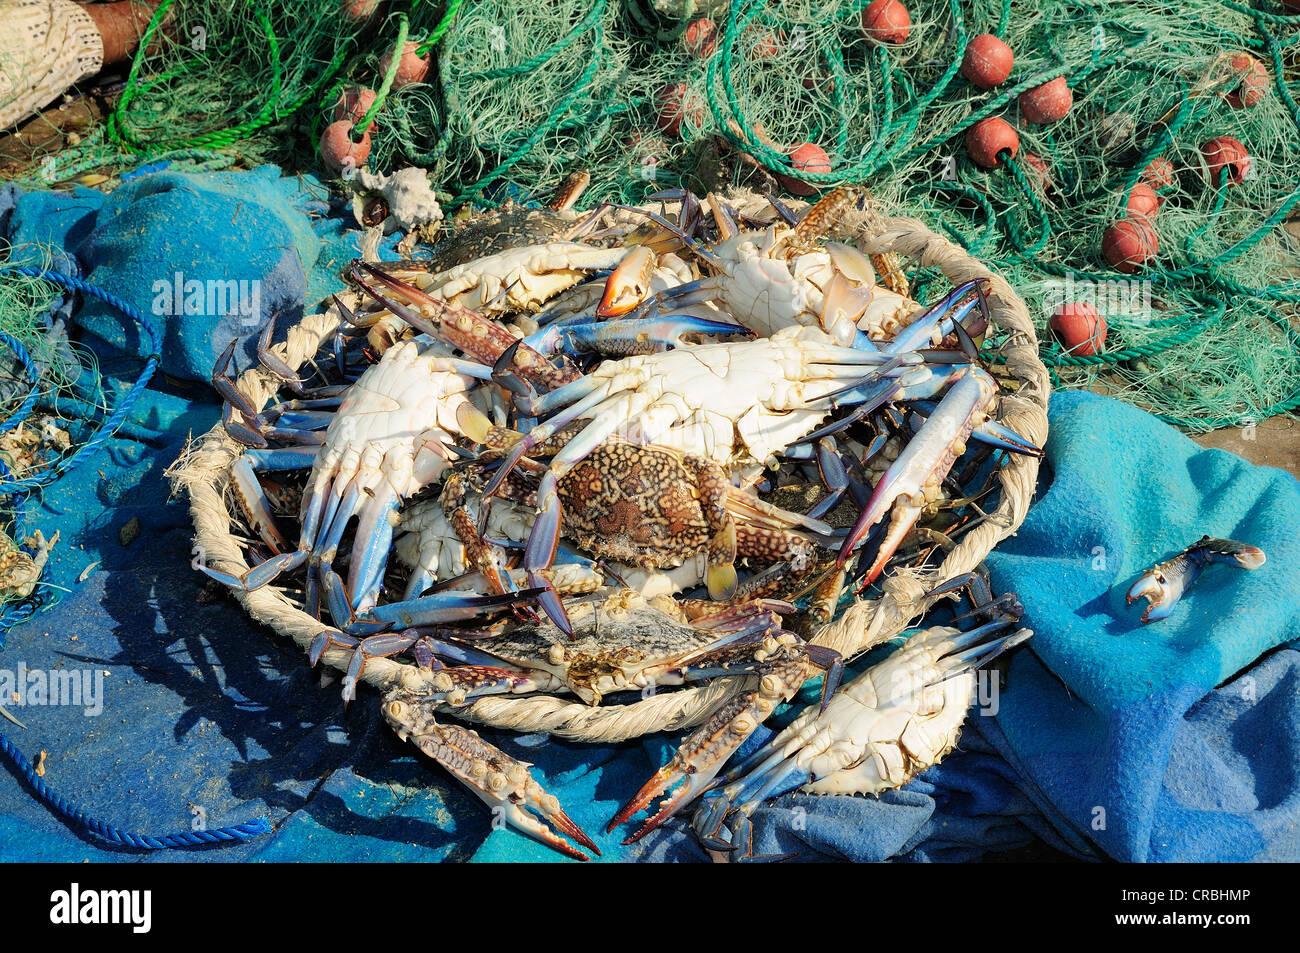 Freshly caught crabs, Qatar - Stock Image